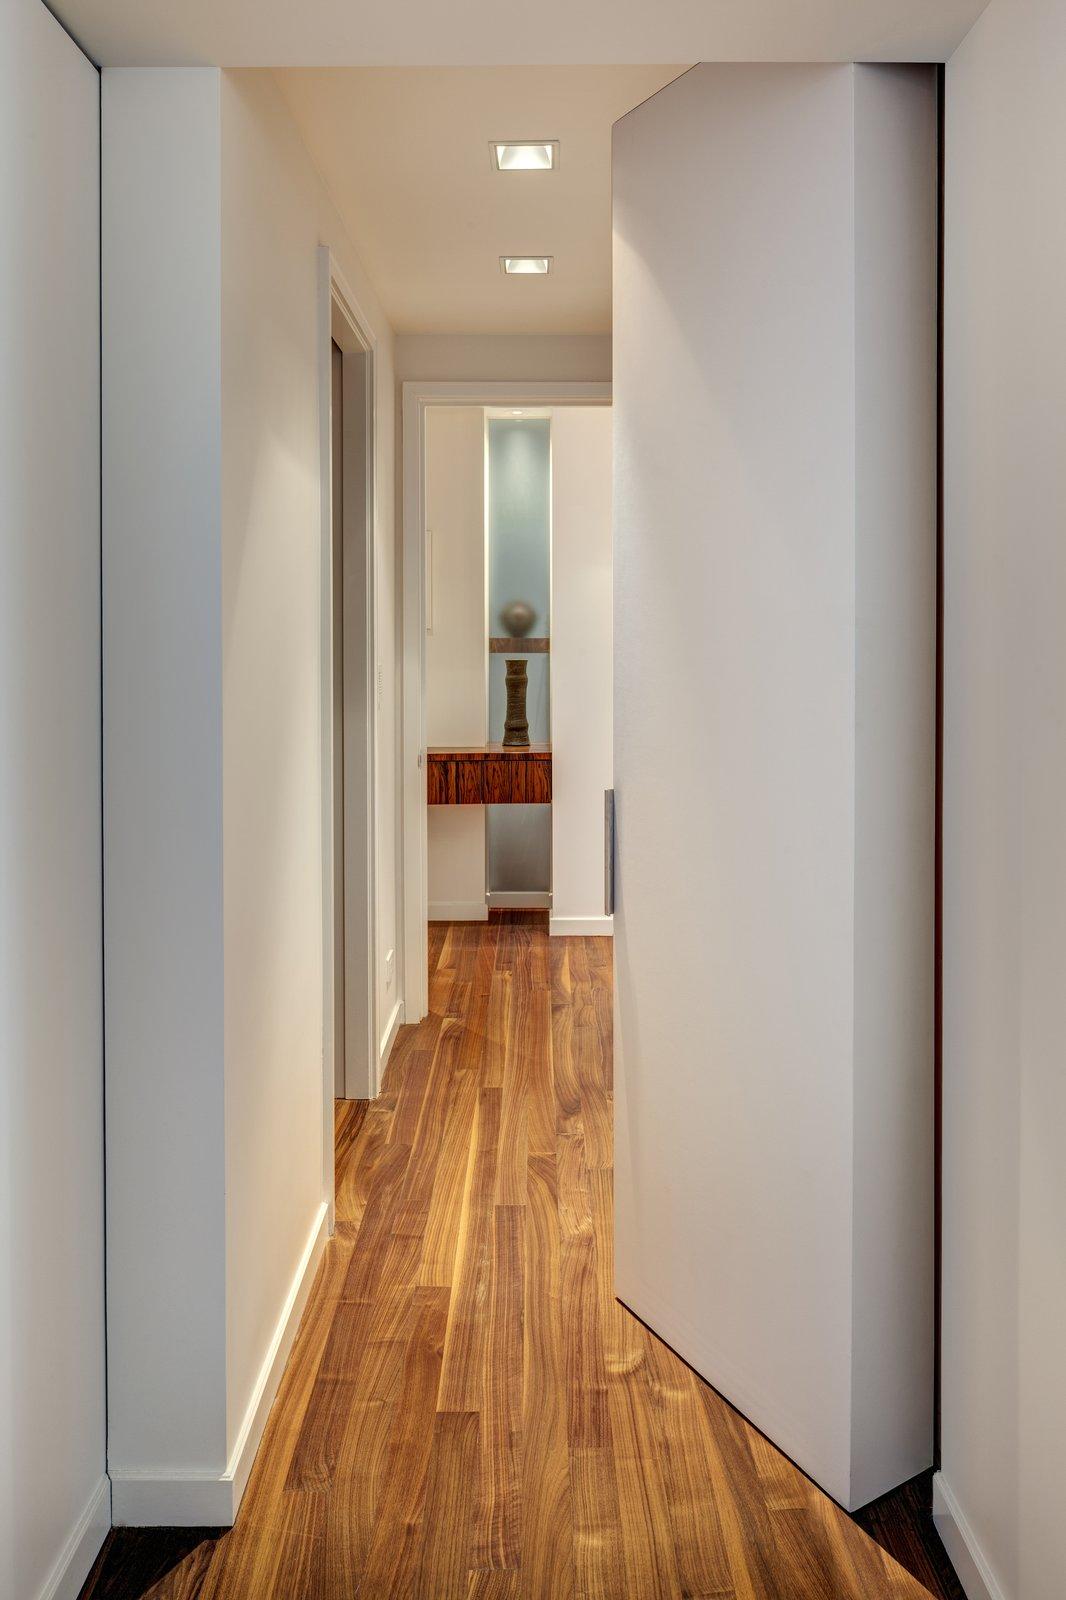 Closet, Interior, Swing, and Hallway Master Bedroom Hallway Closets  Best Hallway Interior Closet Photos from Upper West Side Duplex, New York